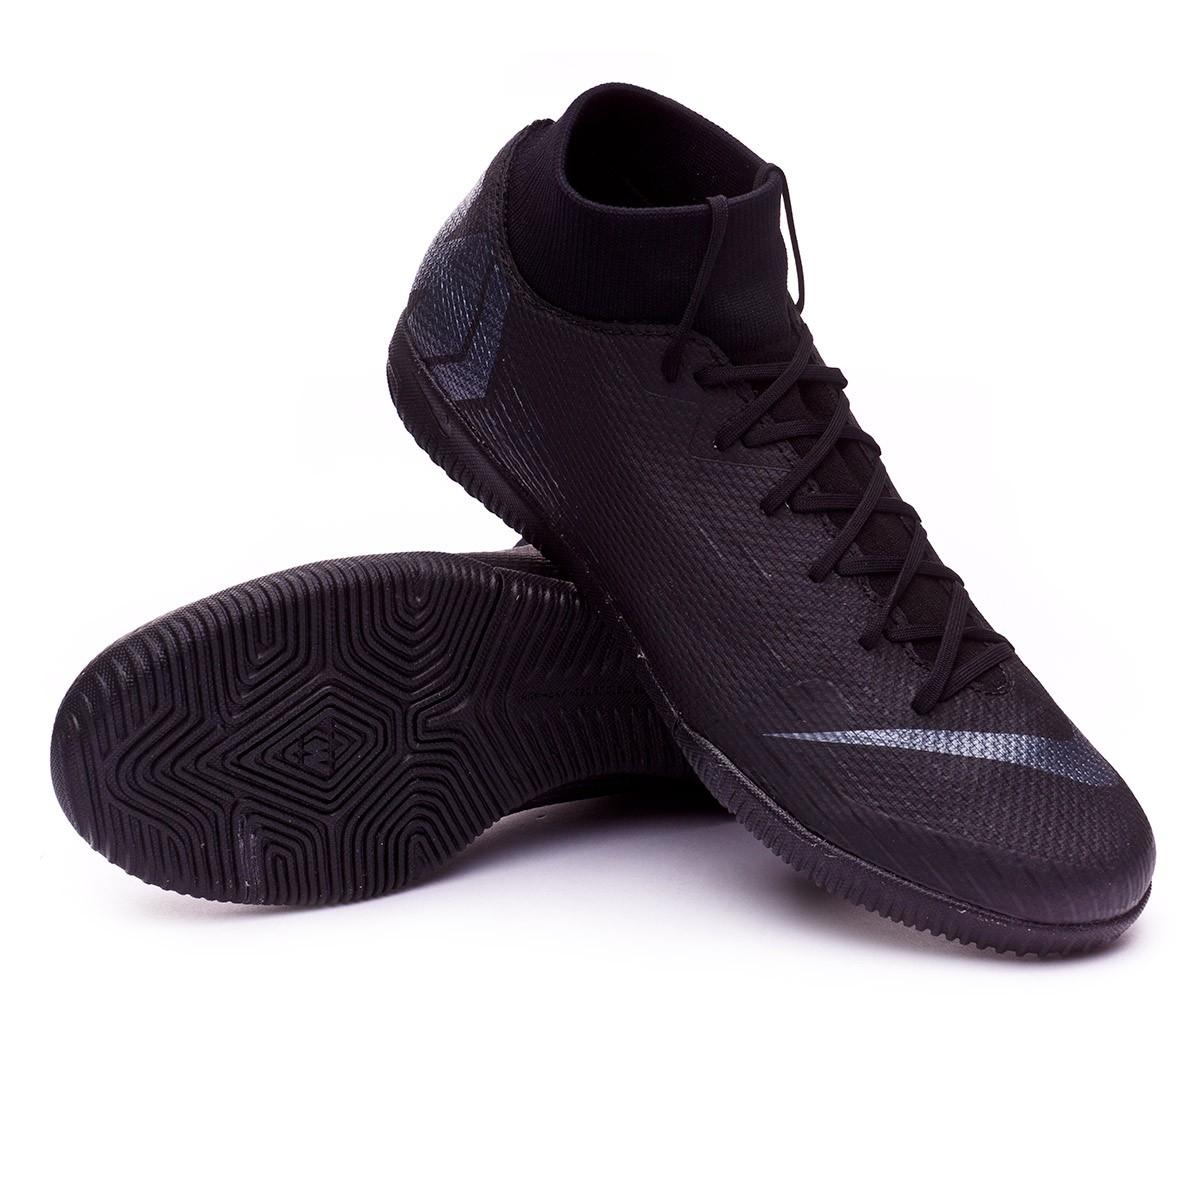 3c403d2672c9 Futsal Boot Nike Mercurial Superfly VI Academy IC Black - Football ...